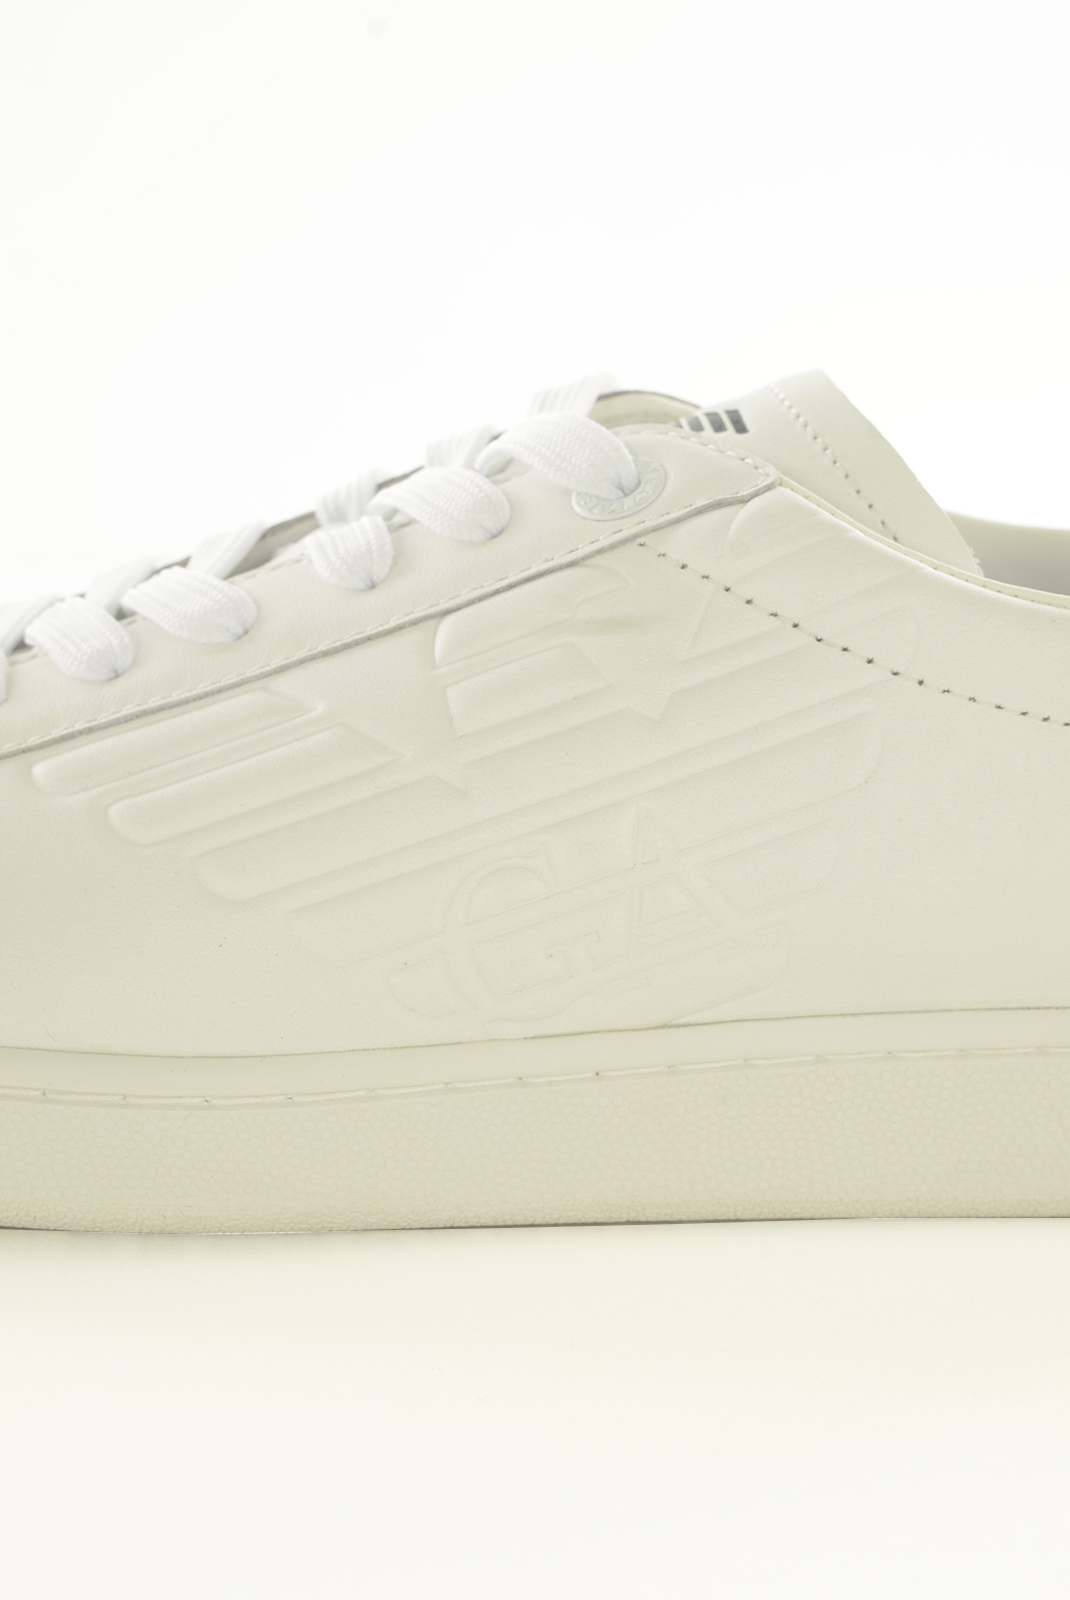 Chaussures   Emporio armani 278049 CC299 00010 BLANC